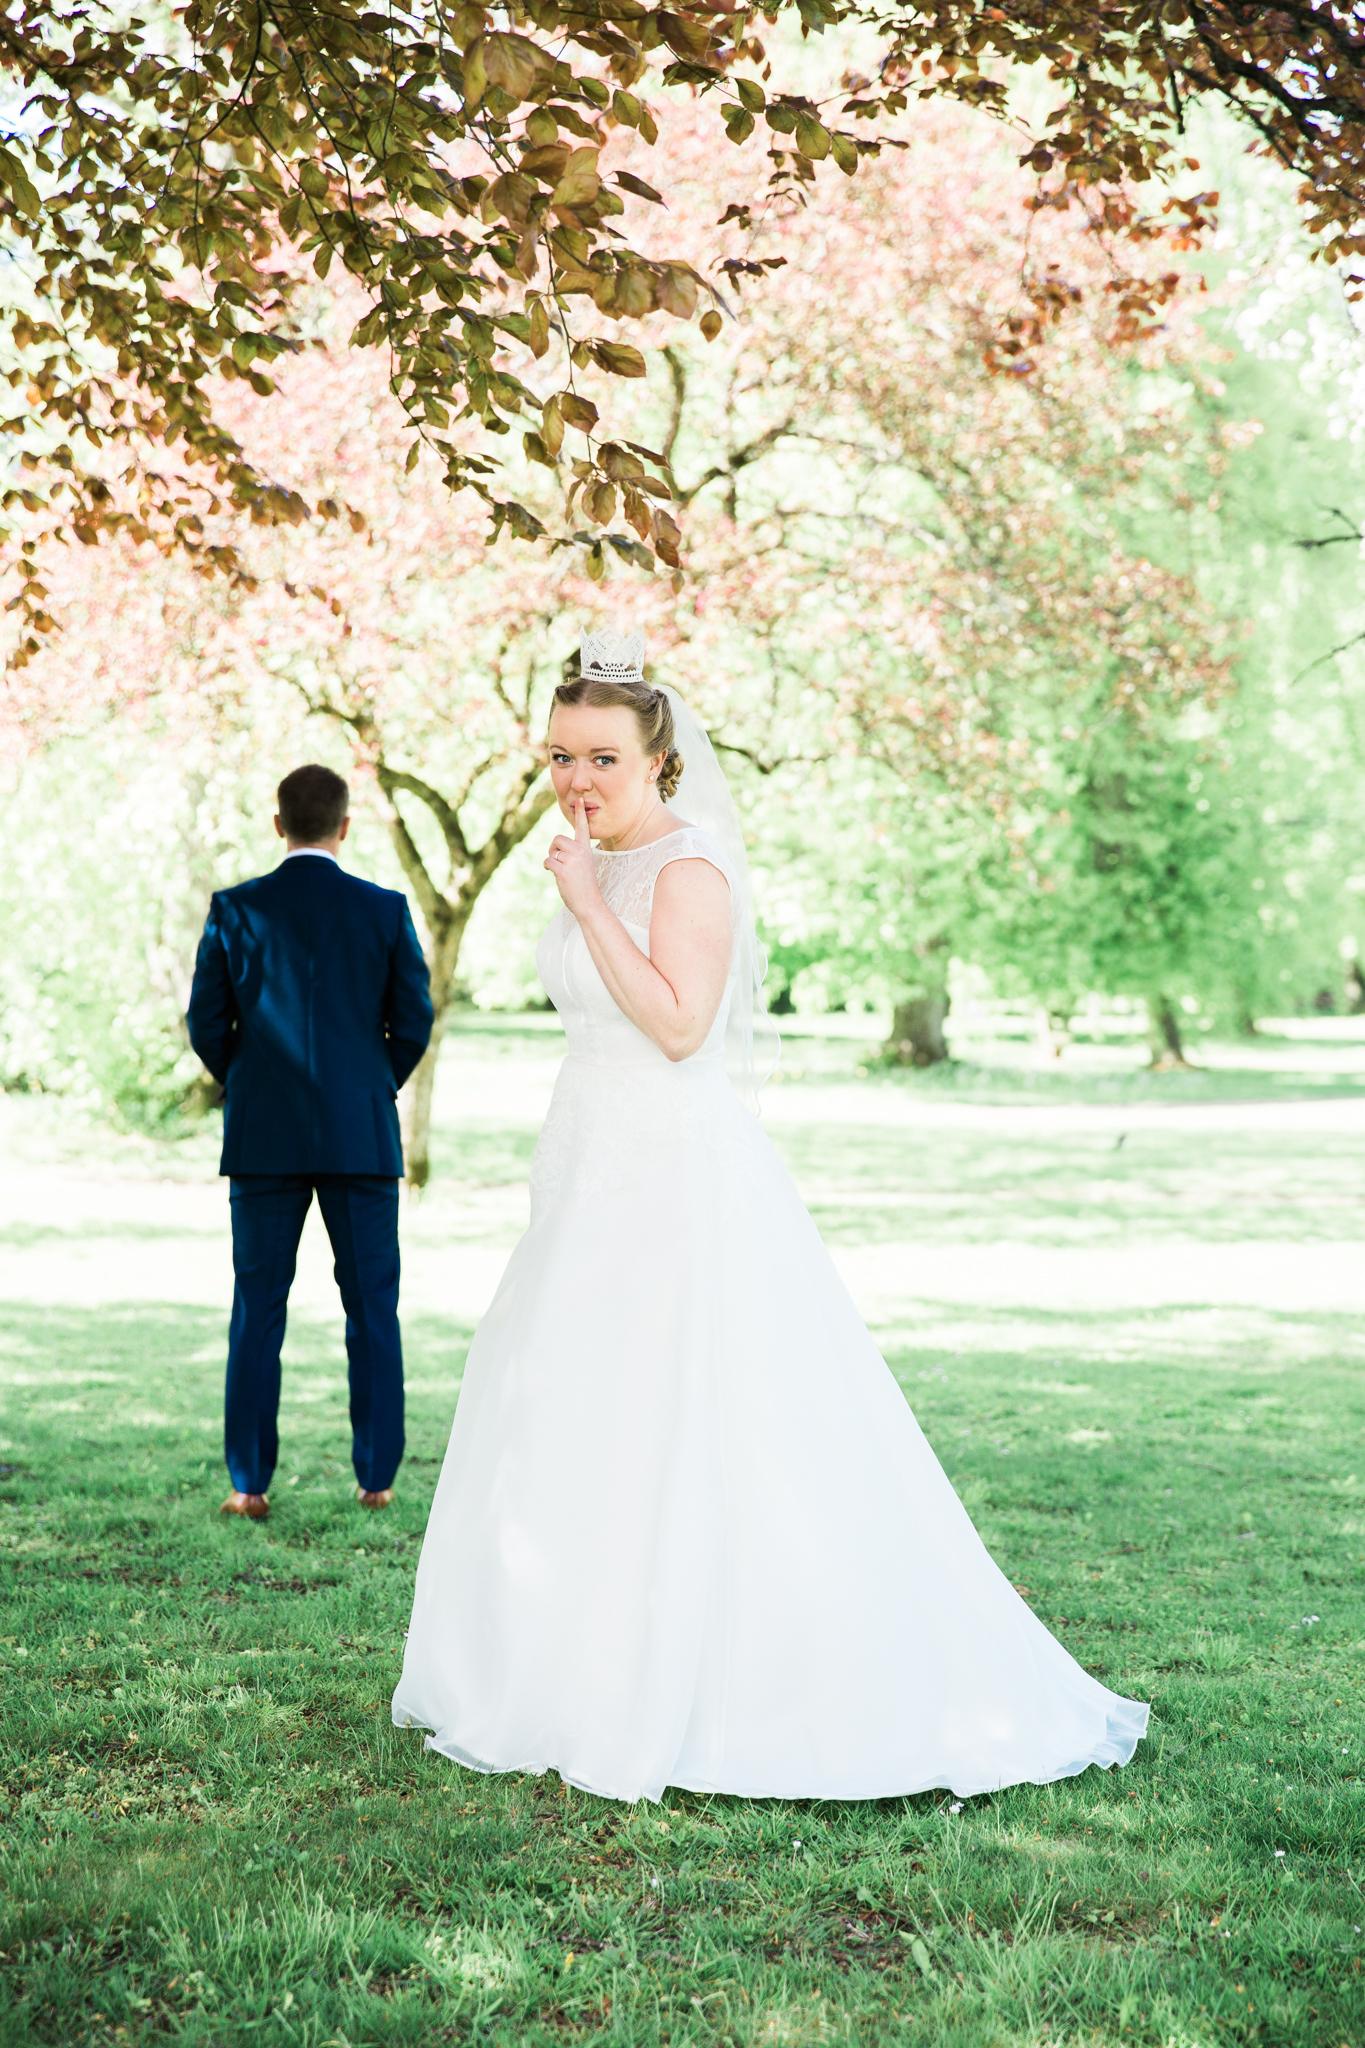 ViOli Photography bröllopsfotograf-Karlshamn-Blekinge-Ronneby-Karlskrona-Sölvesborg-Bromölla-Kristianstad (6 av 35)